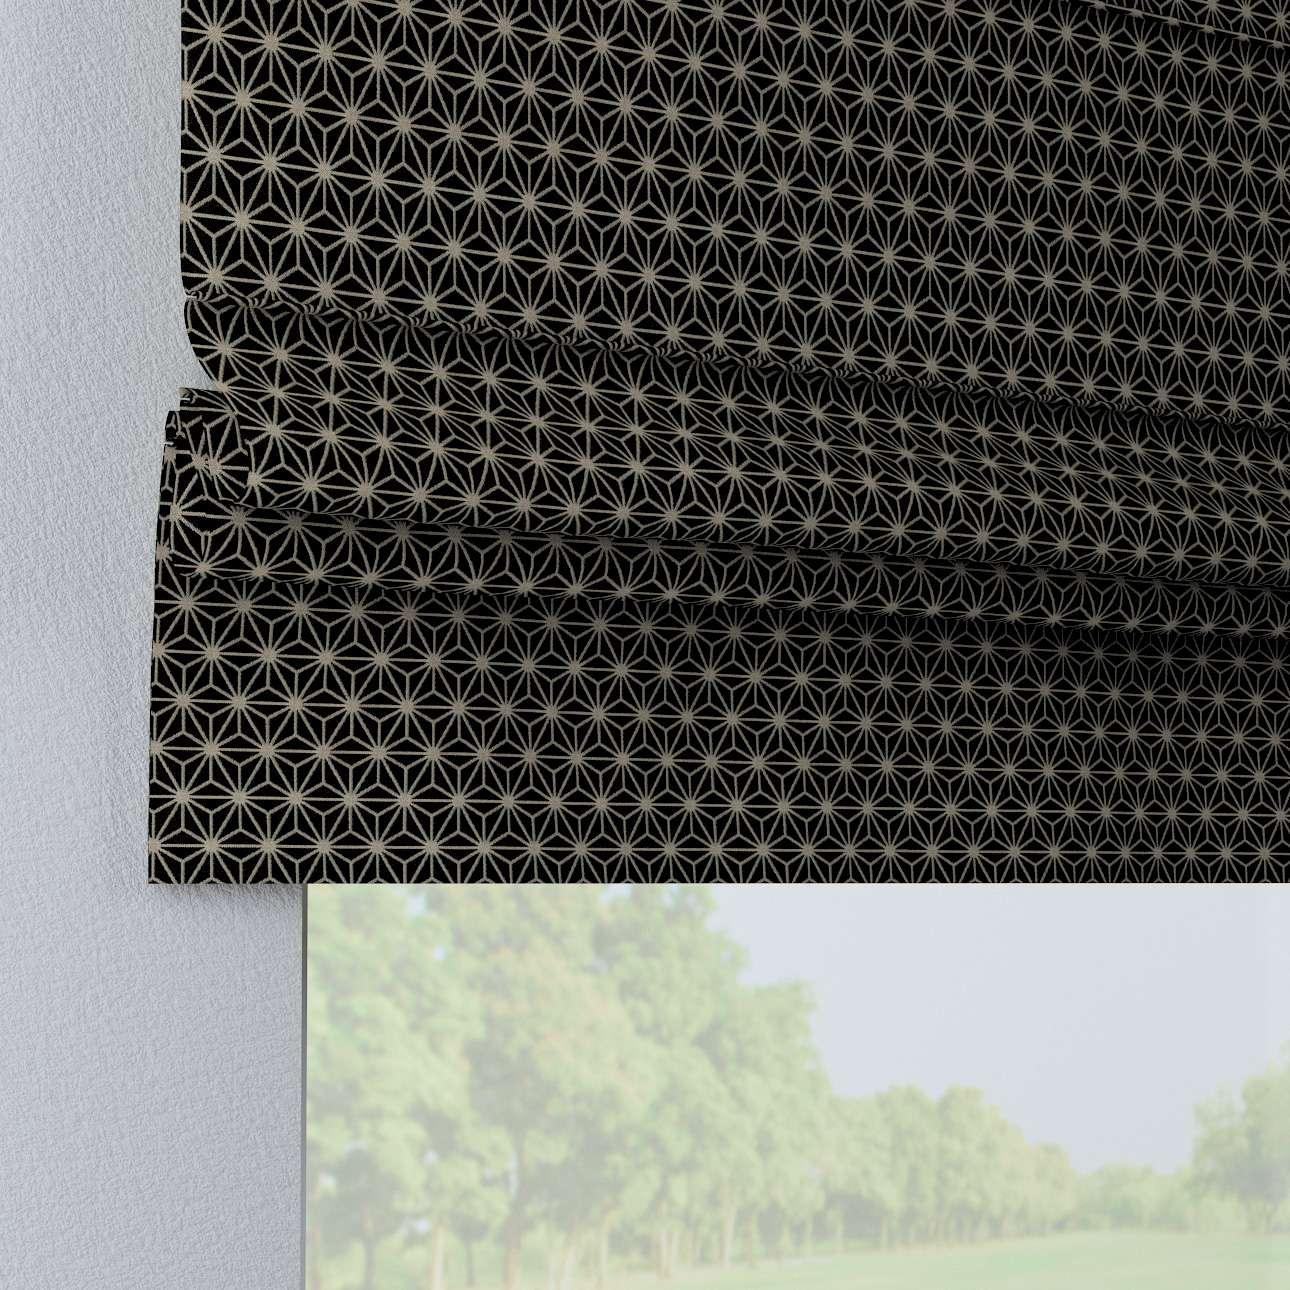 Vouwgordijn Padva van de collectie Black & White, Stof: 142-56